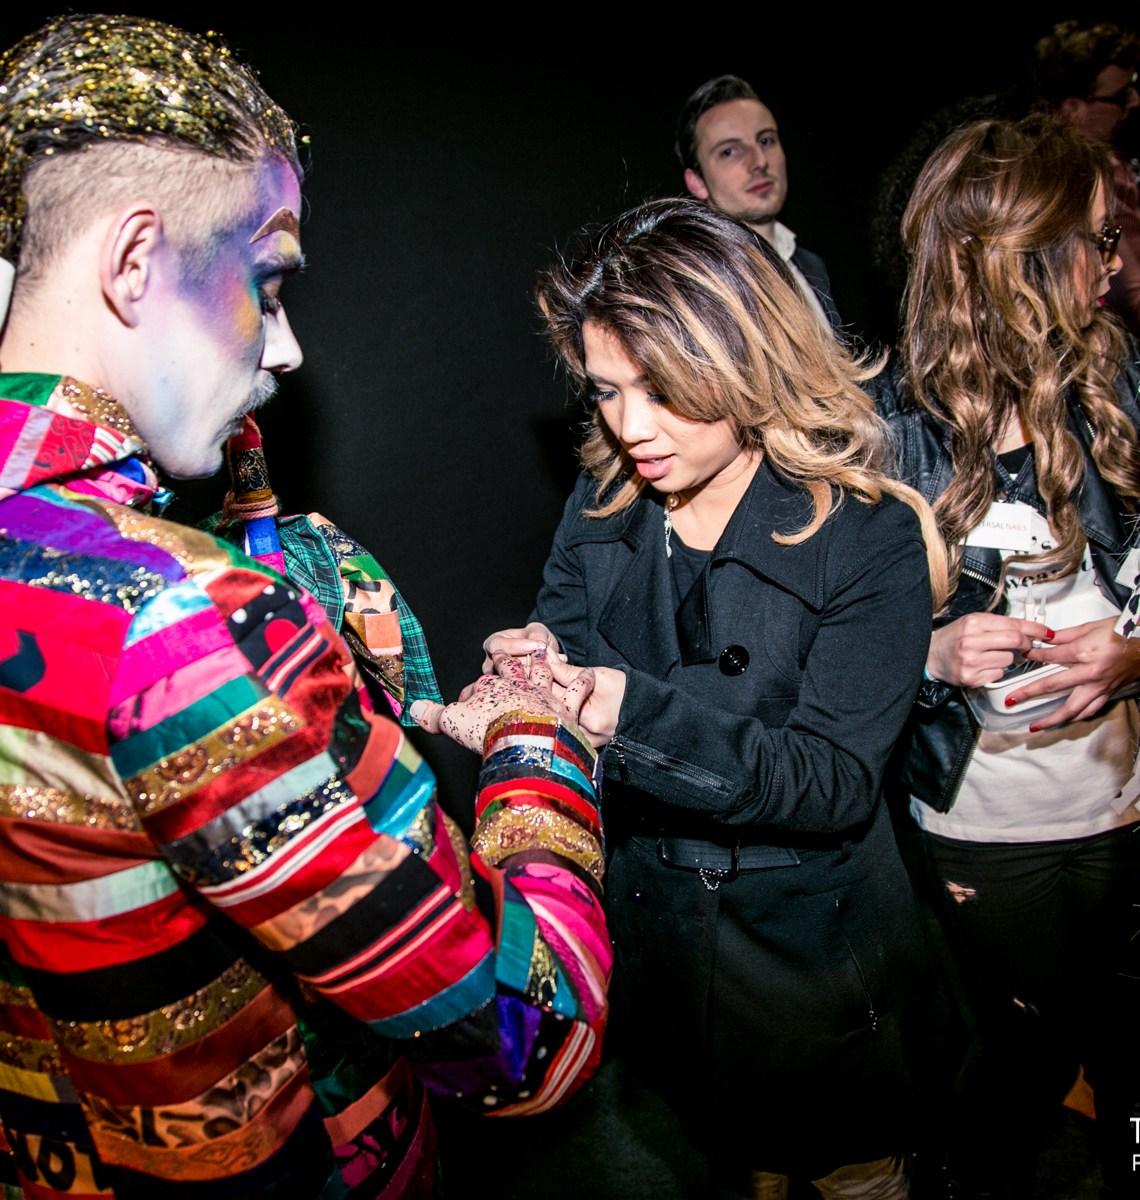 Kimmylien doet backstage de nagels van Bas Kosters